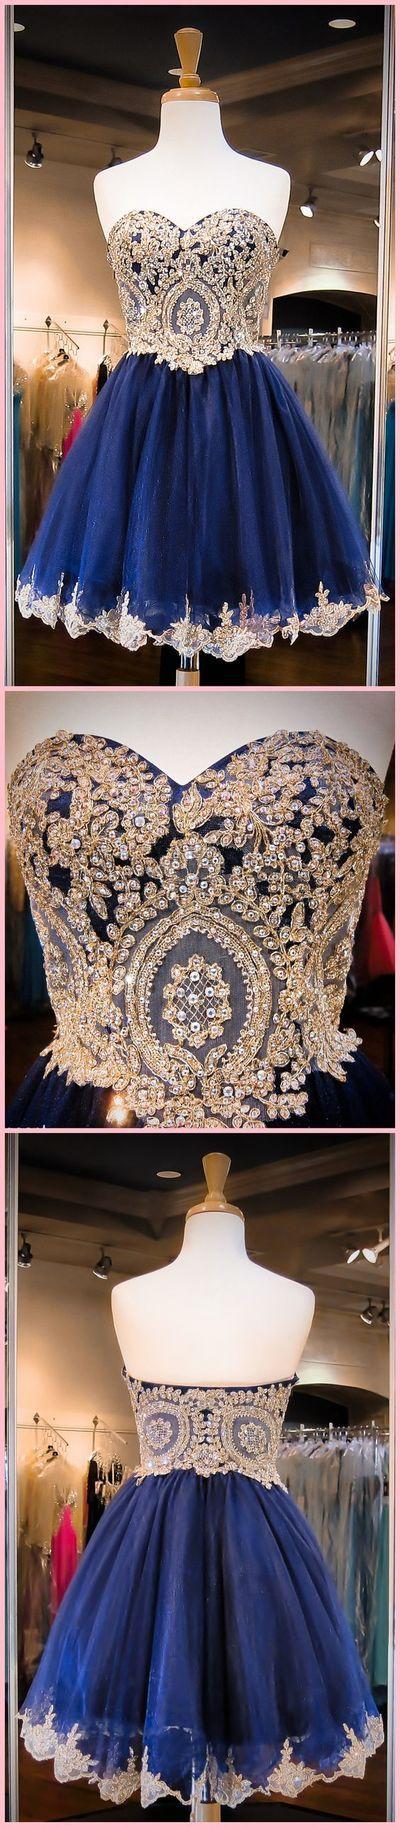 Luxury Royal Sweetheart Homecoming Dress , Mini Short Prom Dress ,Dreamlike Homecoming Dress,Backless Tulle Homecoming Dress